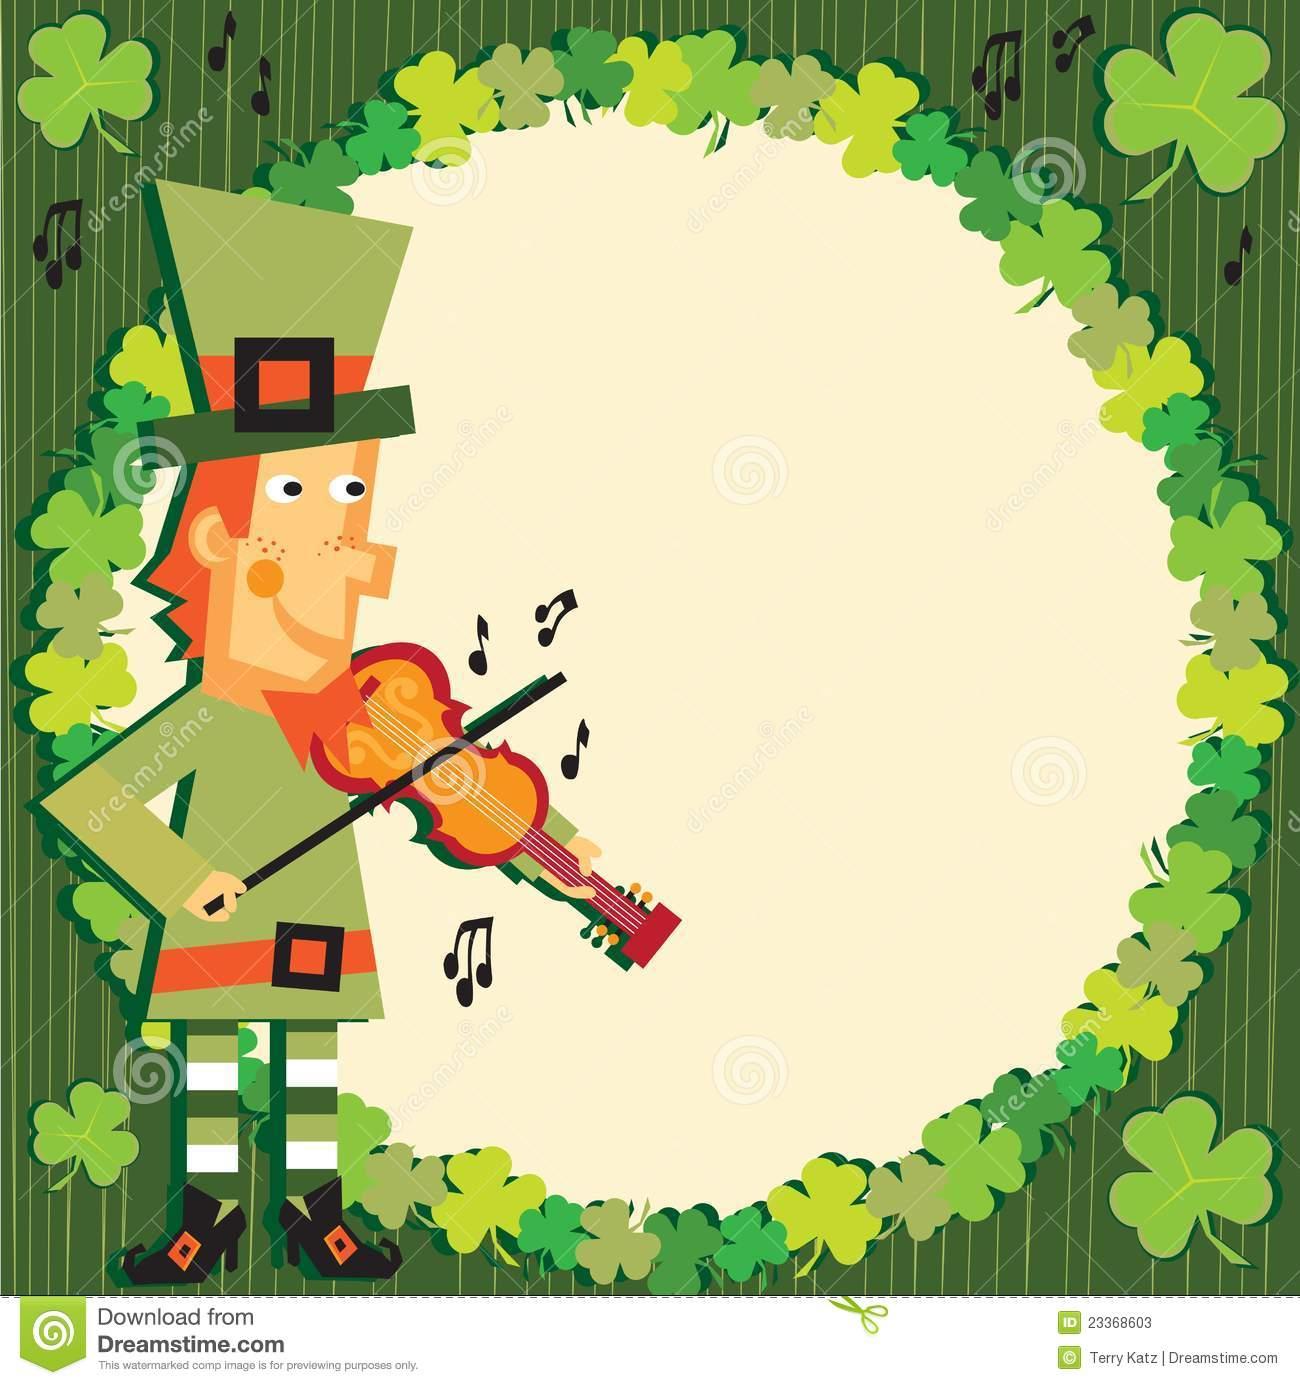 Imagination clipart st patricks day Day Day design com Patrick's